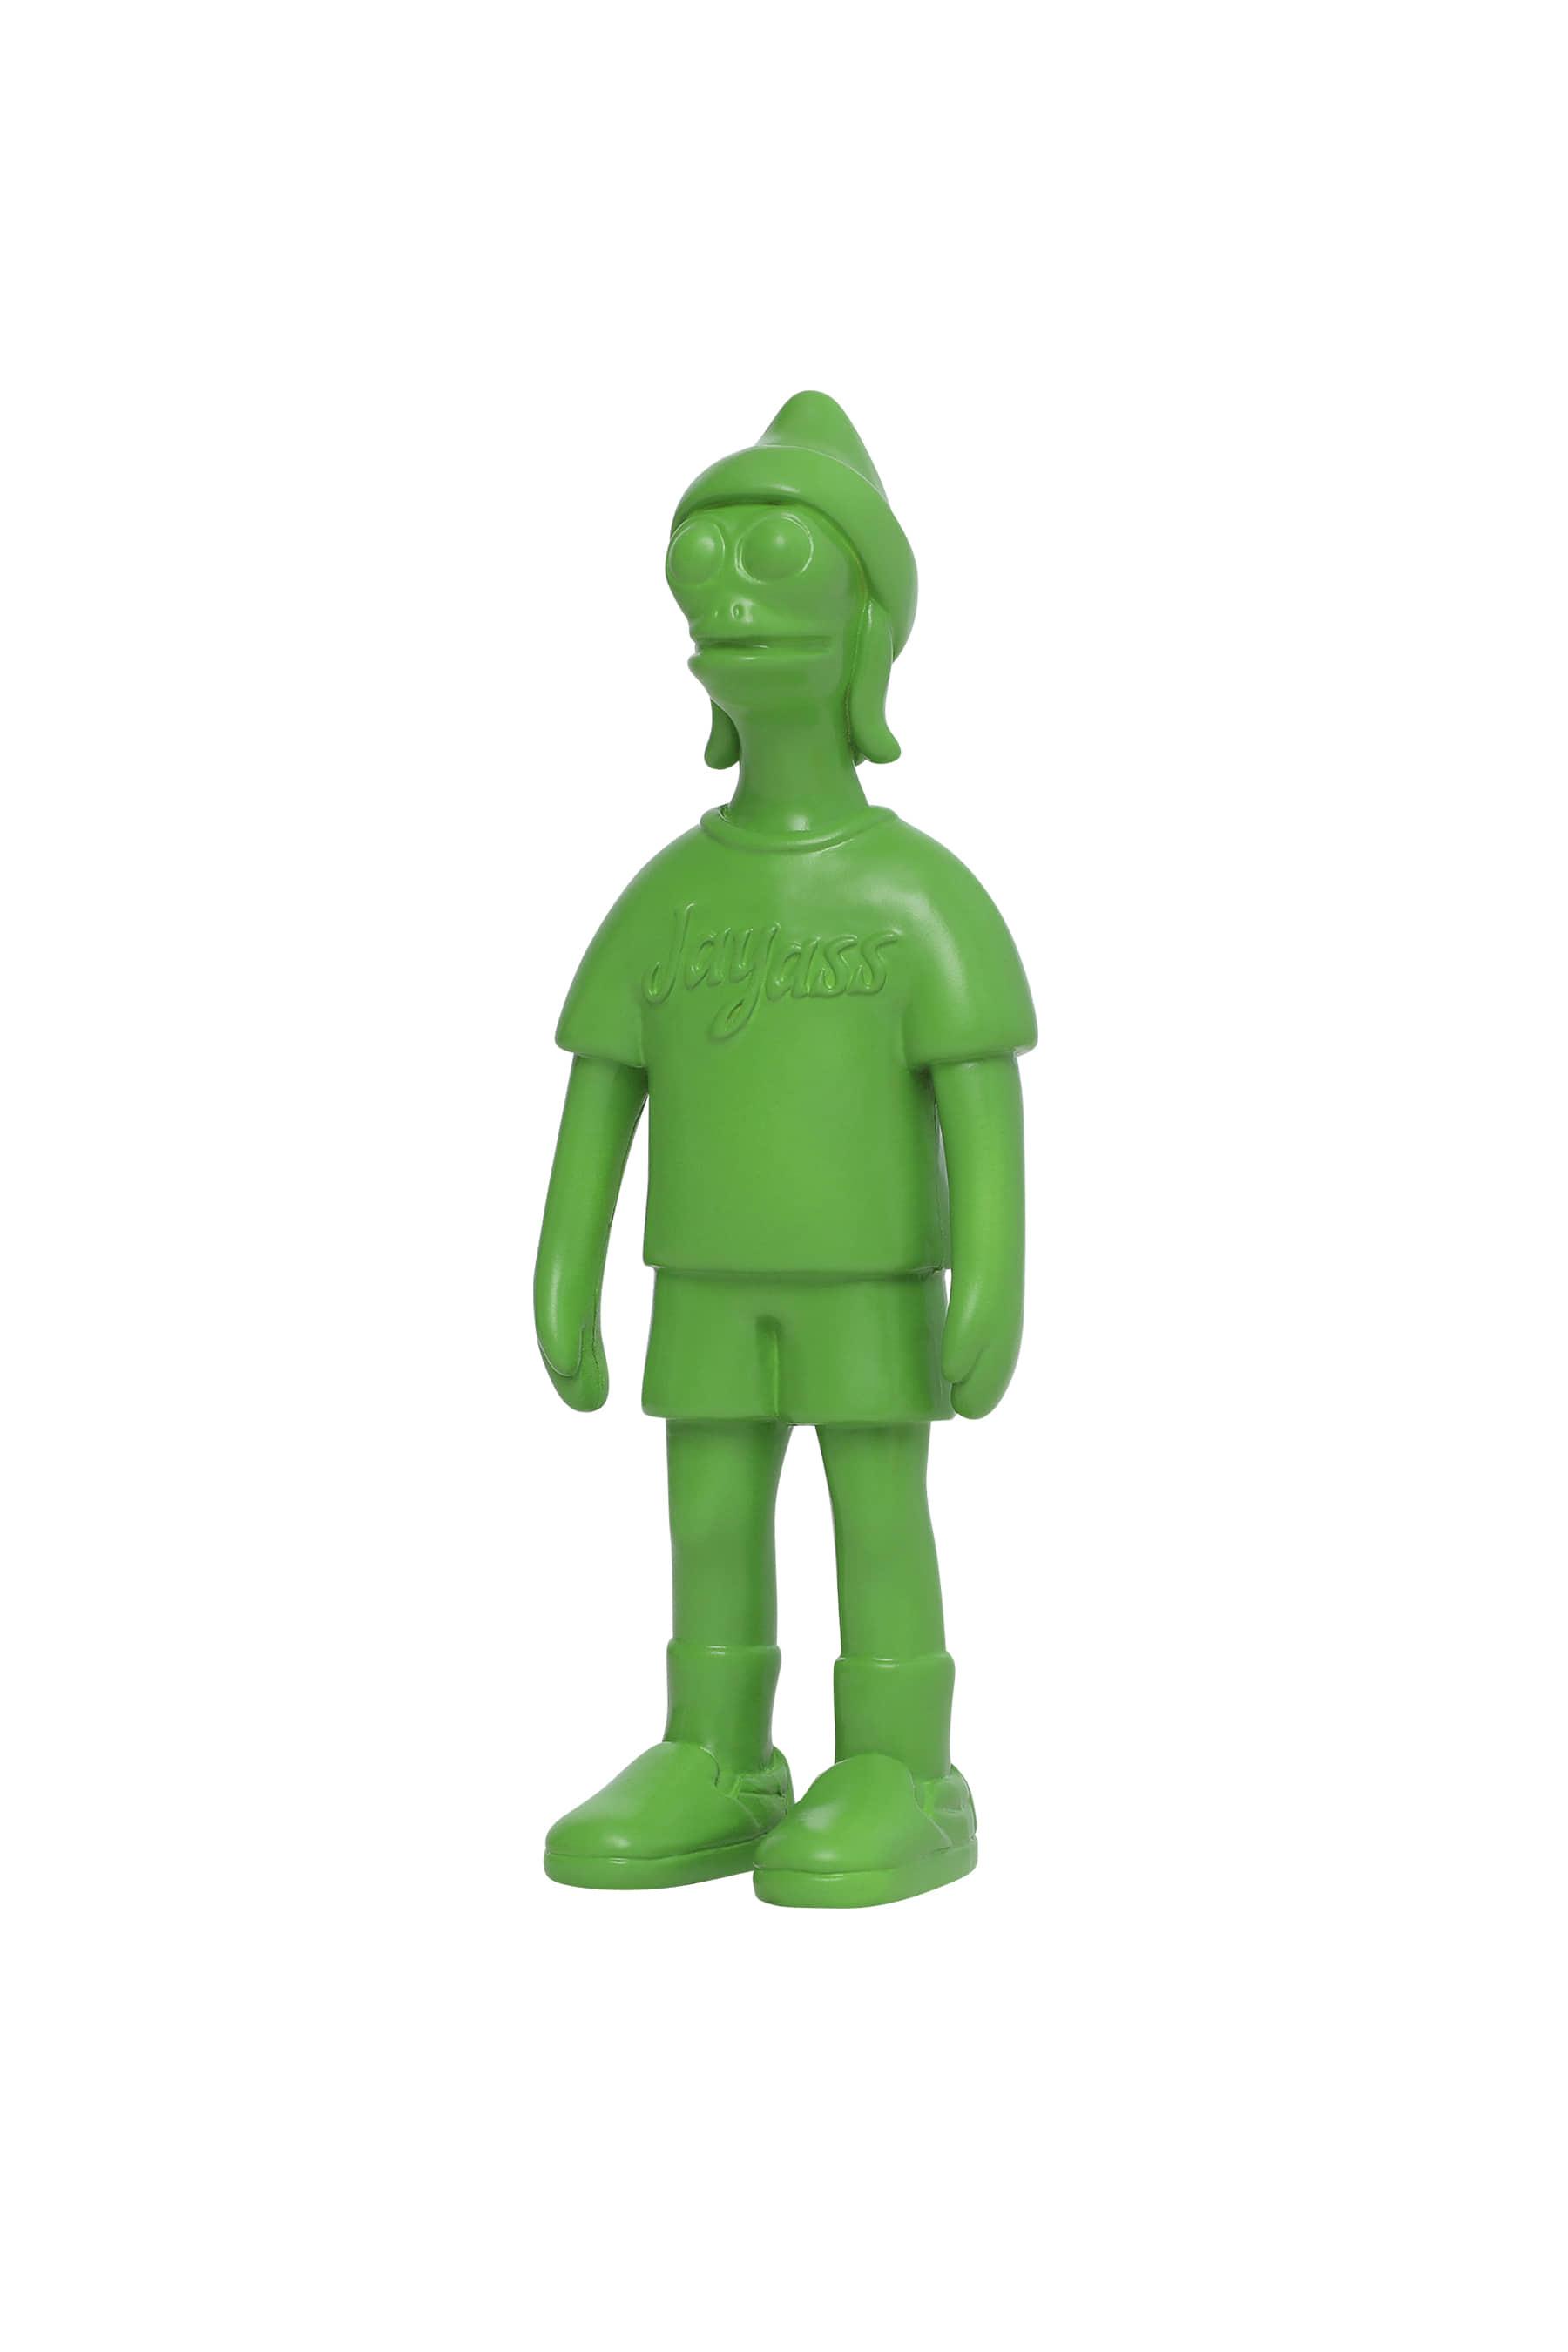 JAYASSEYESEE Figure Green